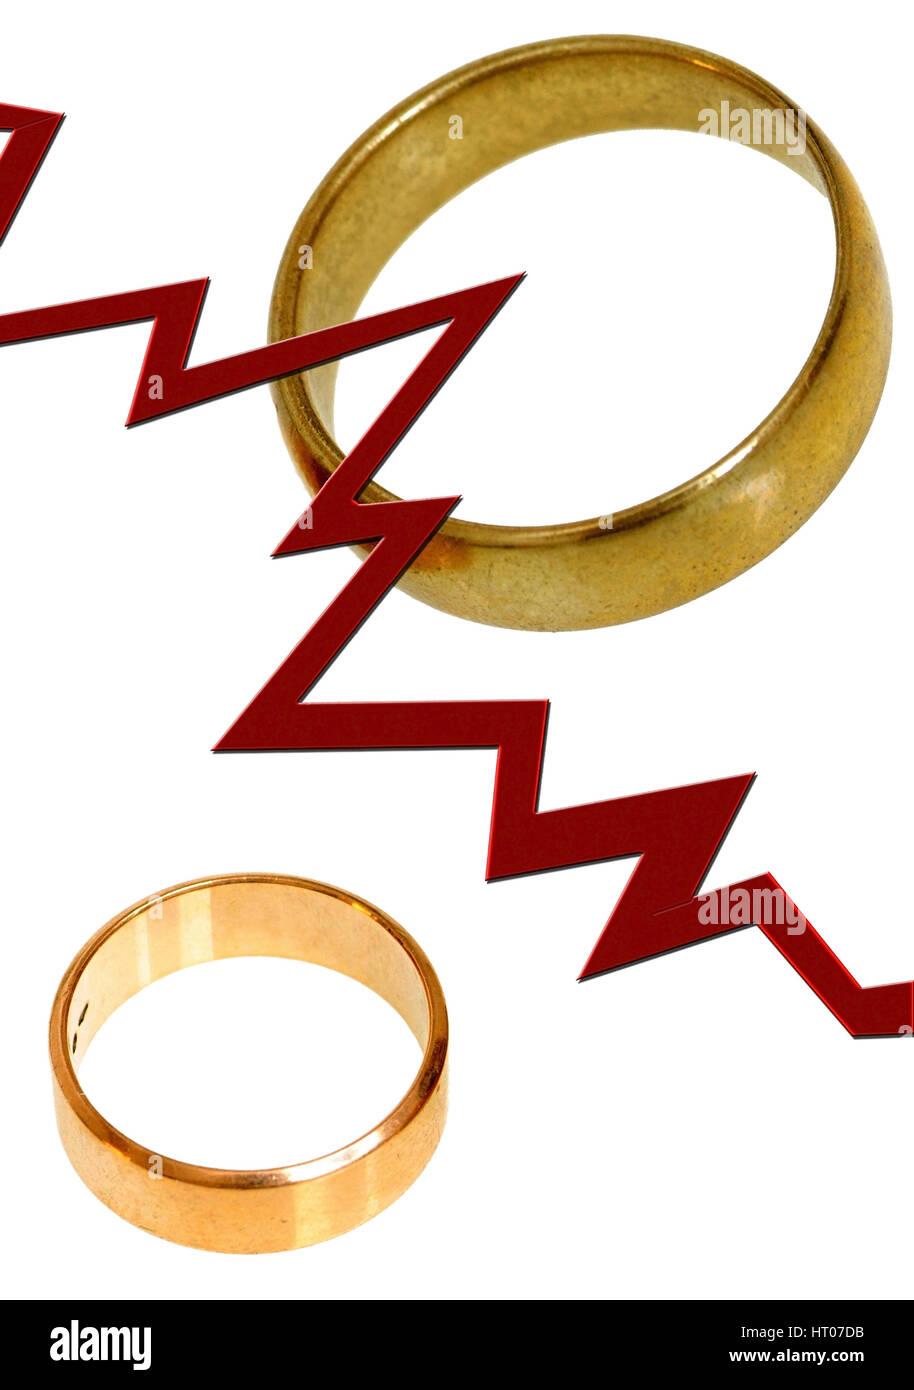 Symbolbild Scheidung - symbolic for divorce - Stock Image